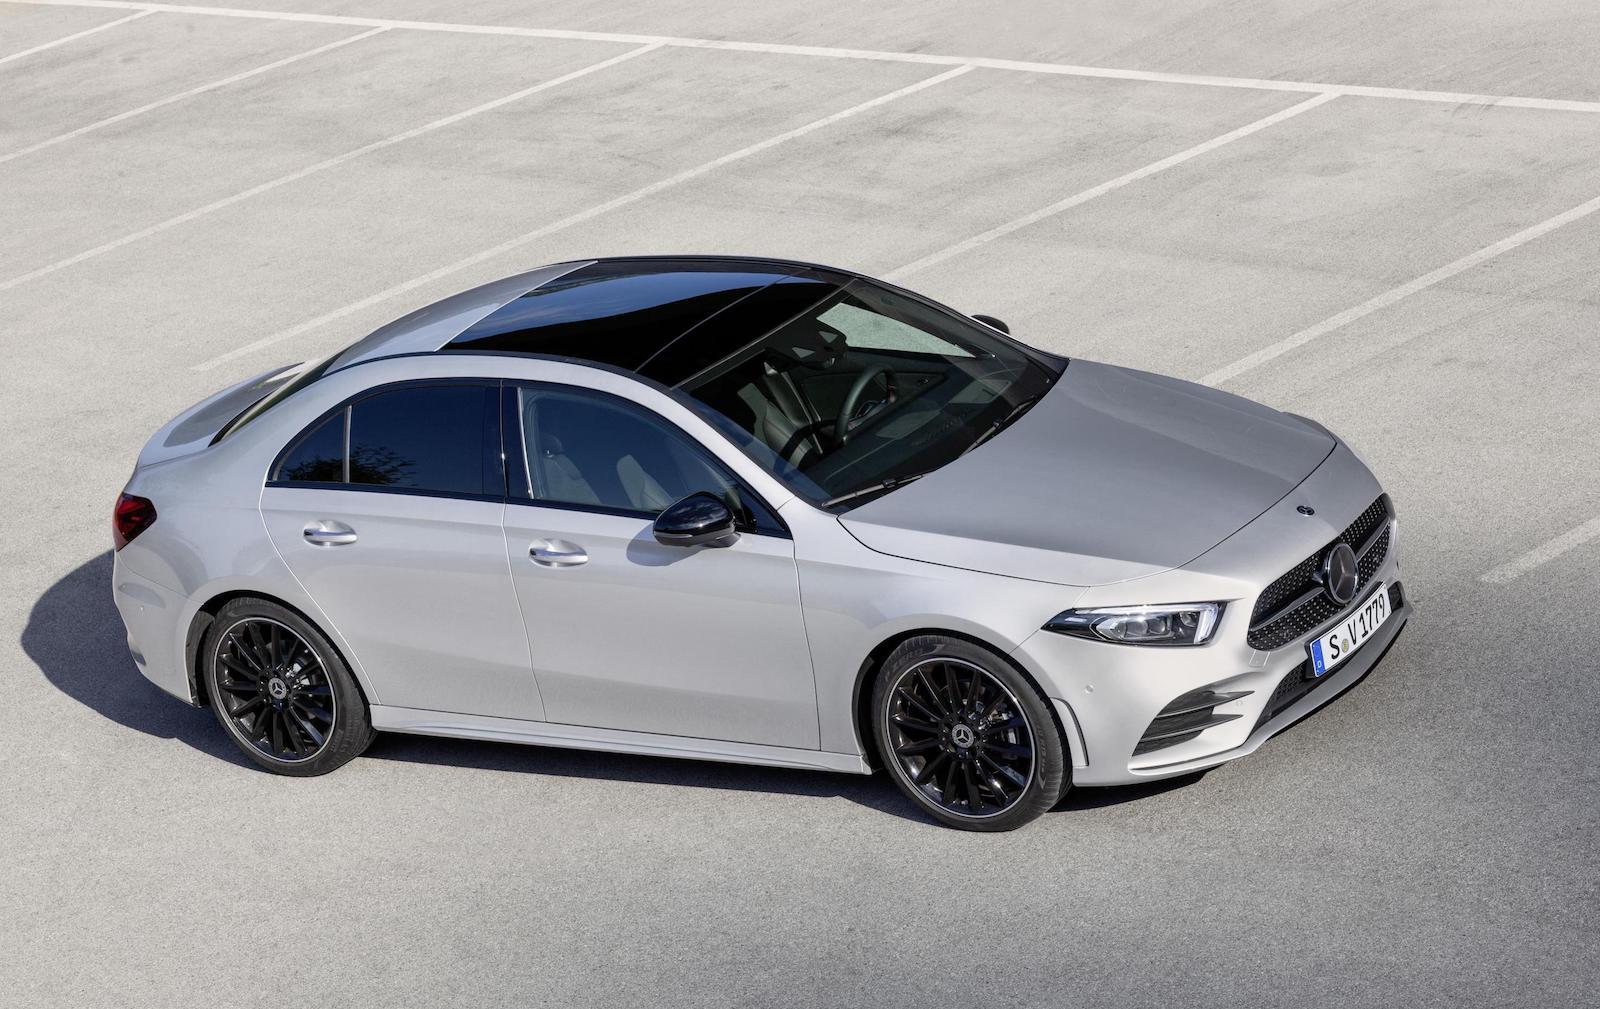 2019 mercedes benz a class sedan revealed performancedrive. Black Bedroom Furniture Sets. Home Design Ideas